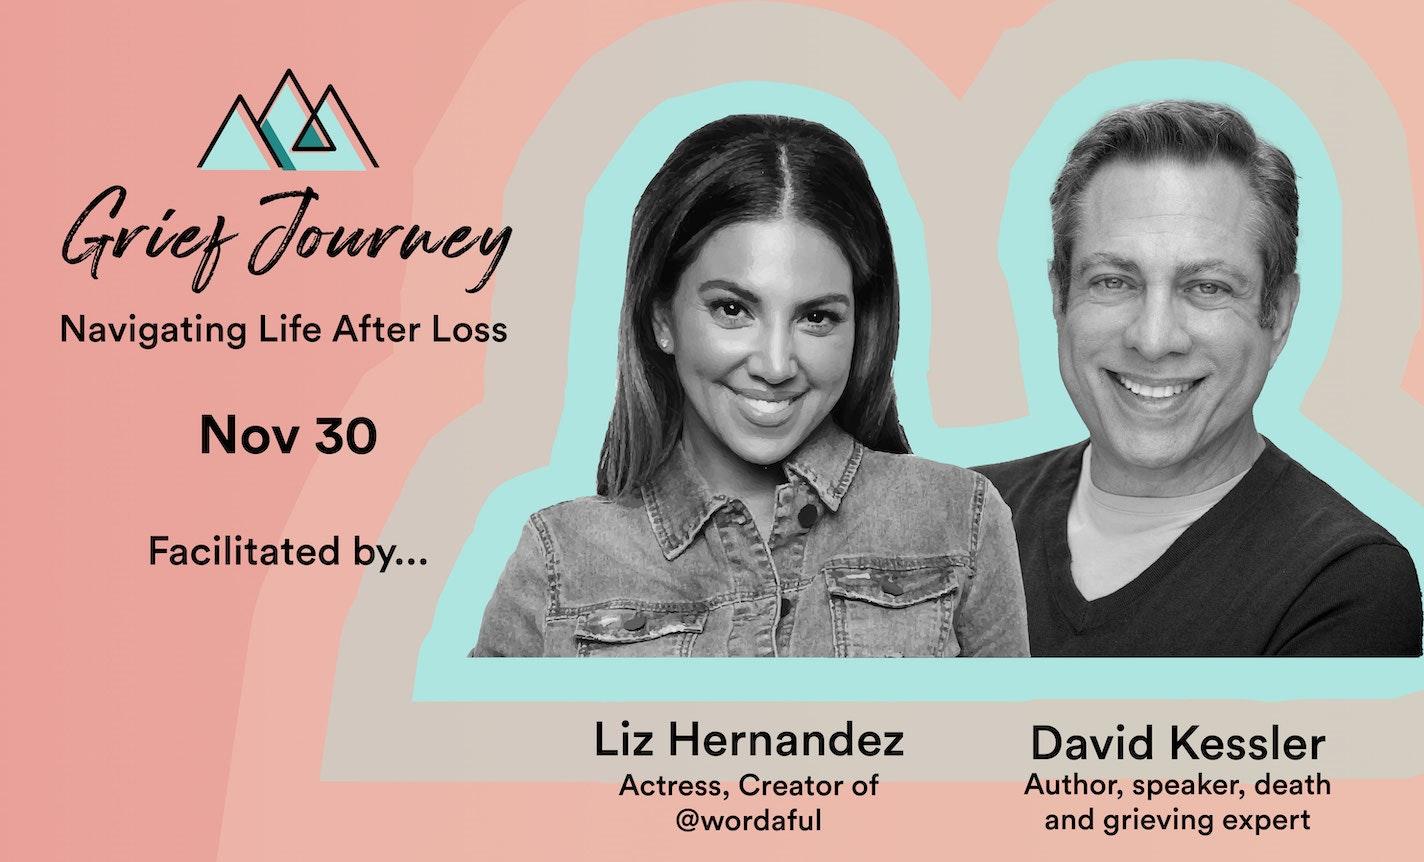 Grief Journey with Liz Hernandez and David Kessler